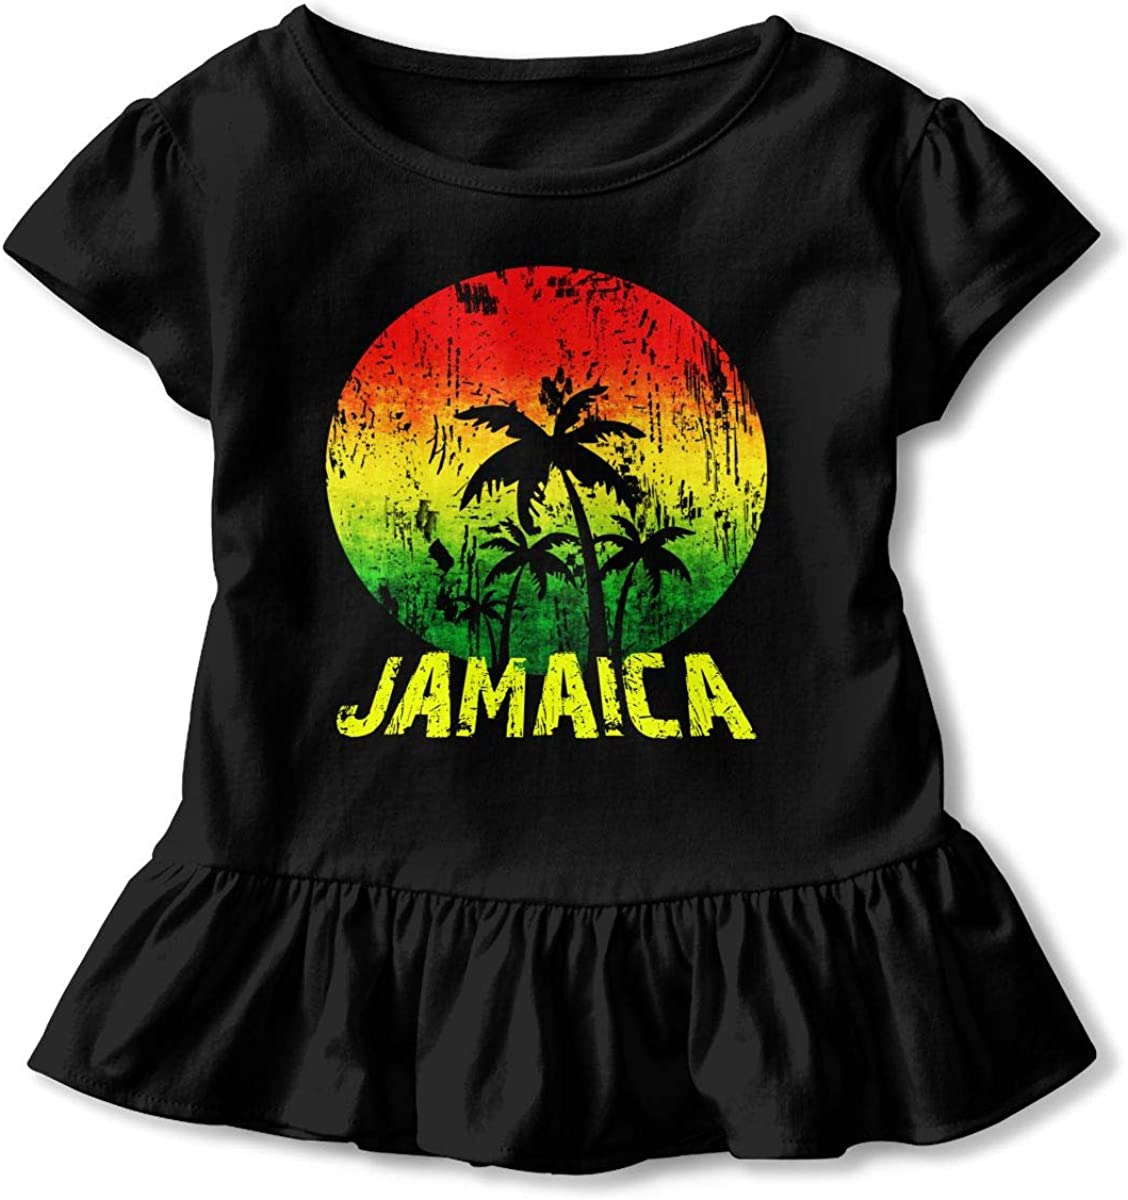 Cheng Jian Bo Jamaica Rasta Flag Coconut Tree Toddler Girls T Shirt Kids Cotton Short Sleeve Ruffle Tee